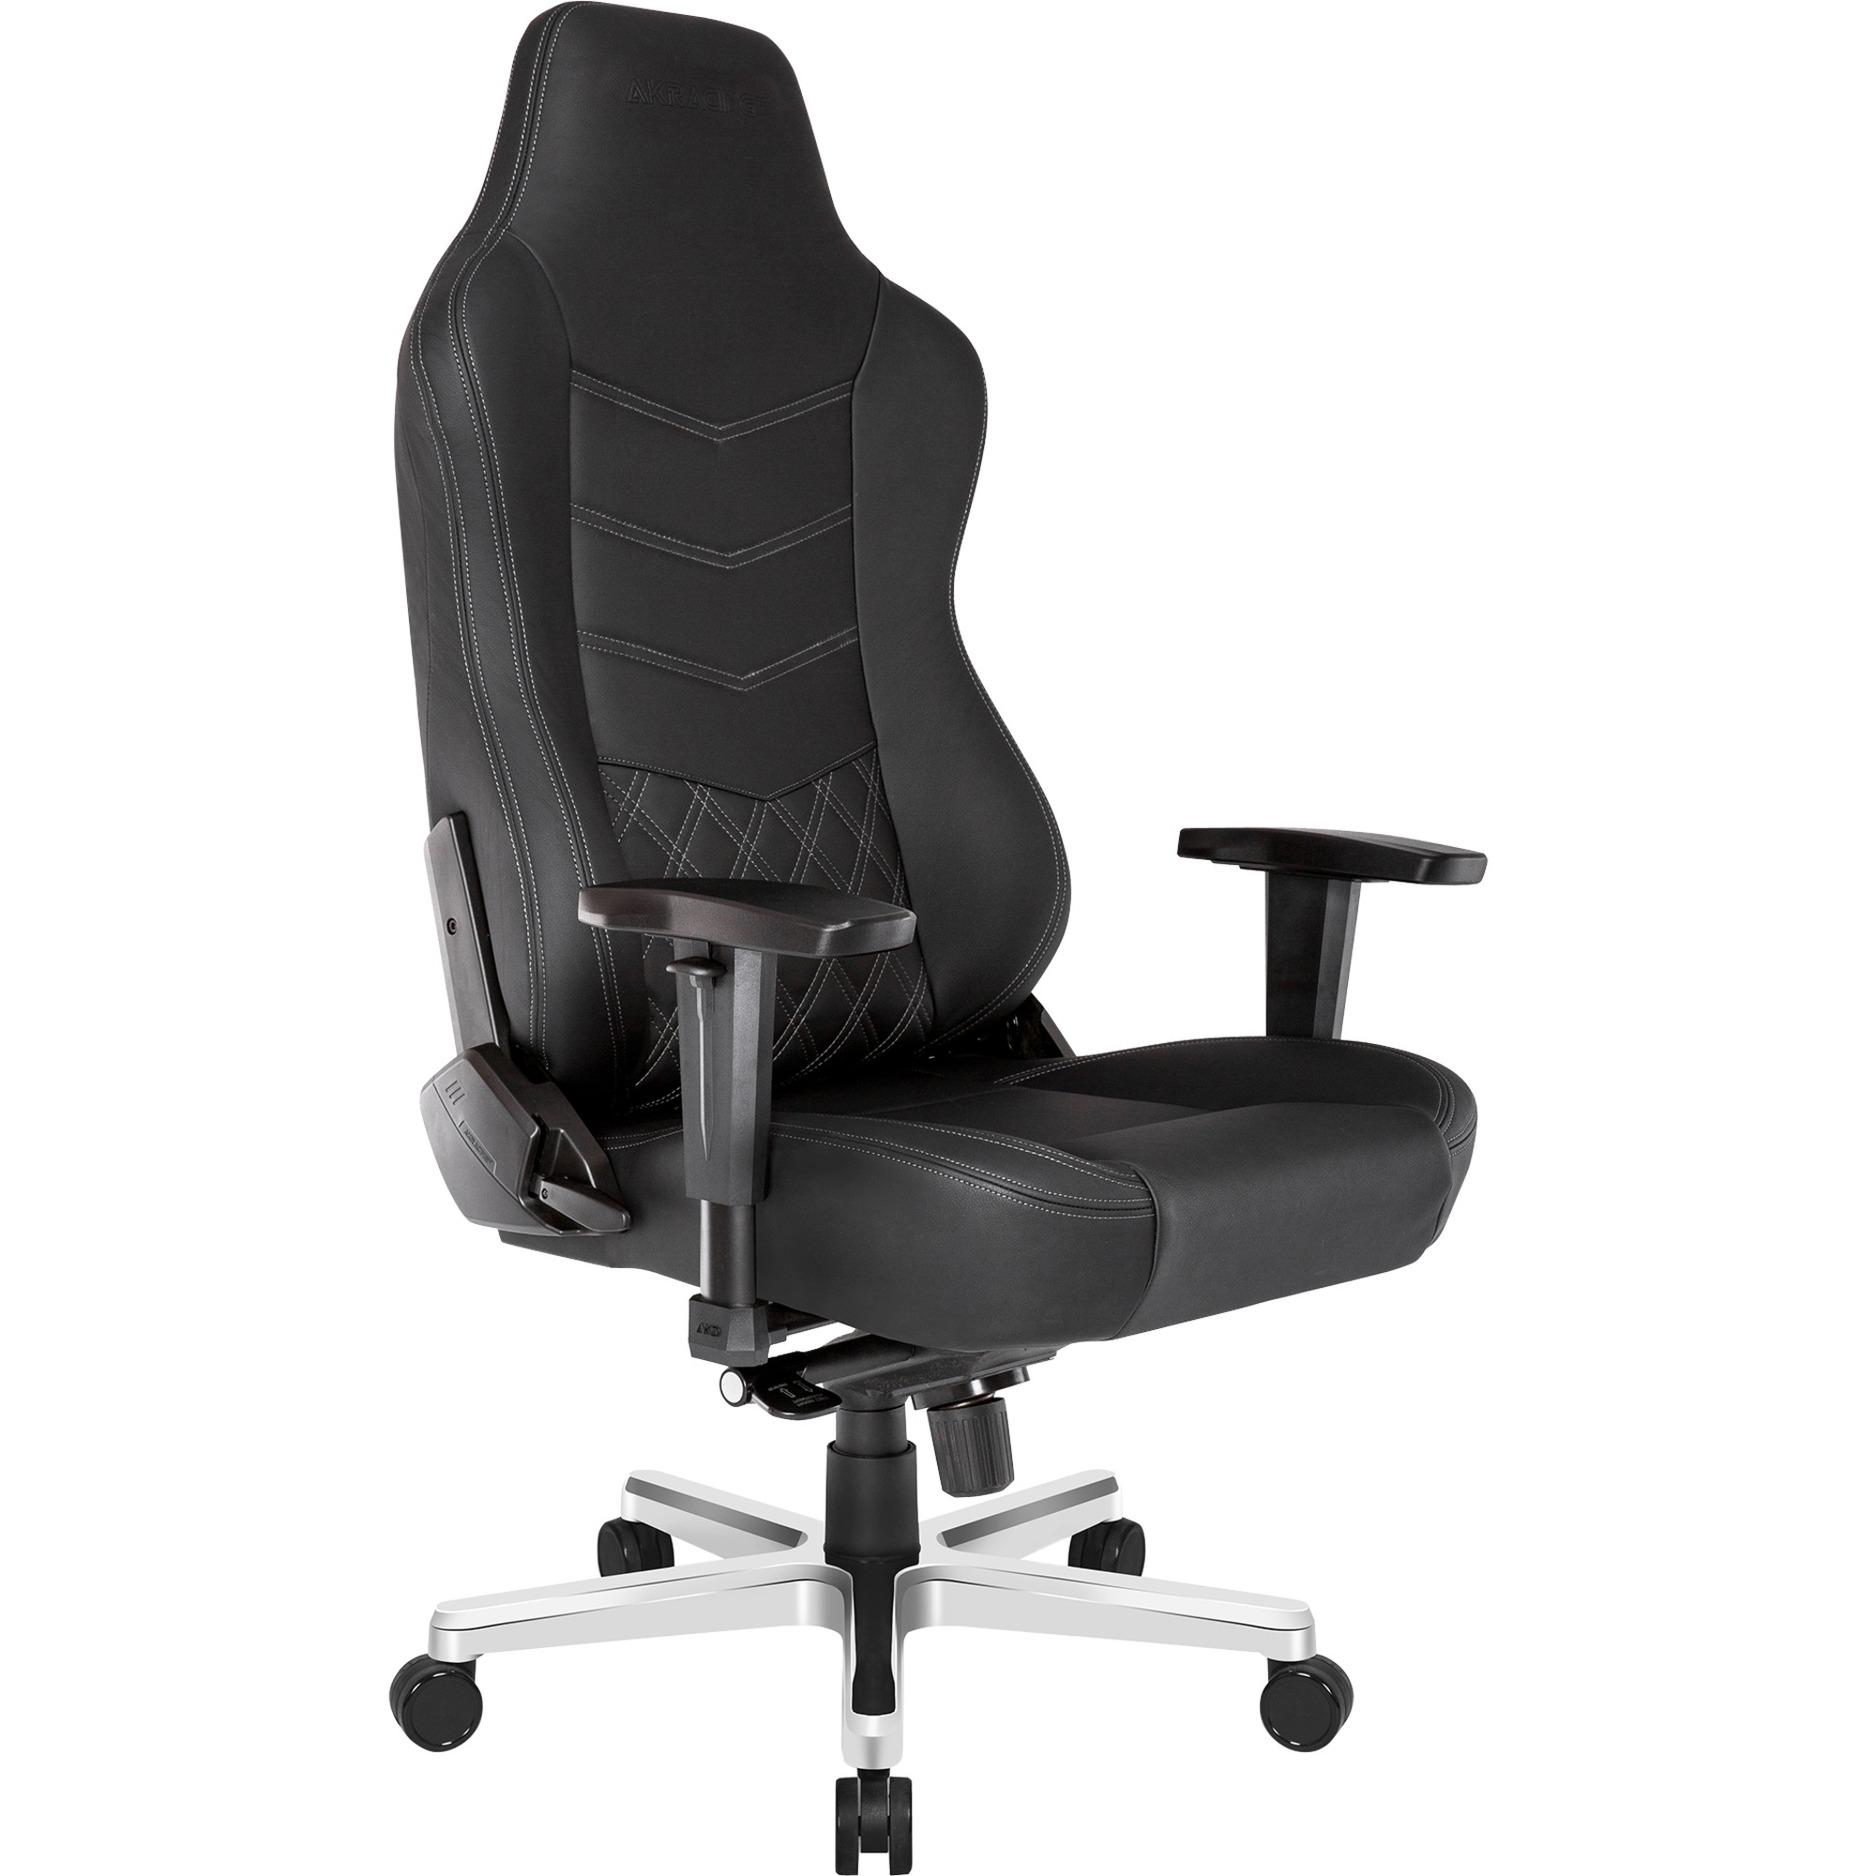 Onyx Deluxe Gaming Chair, Siège de jeu